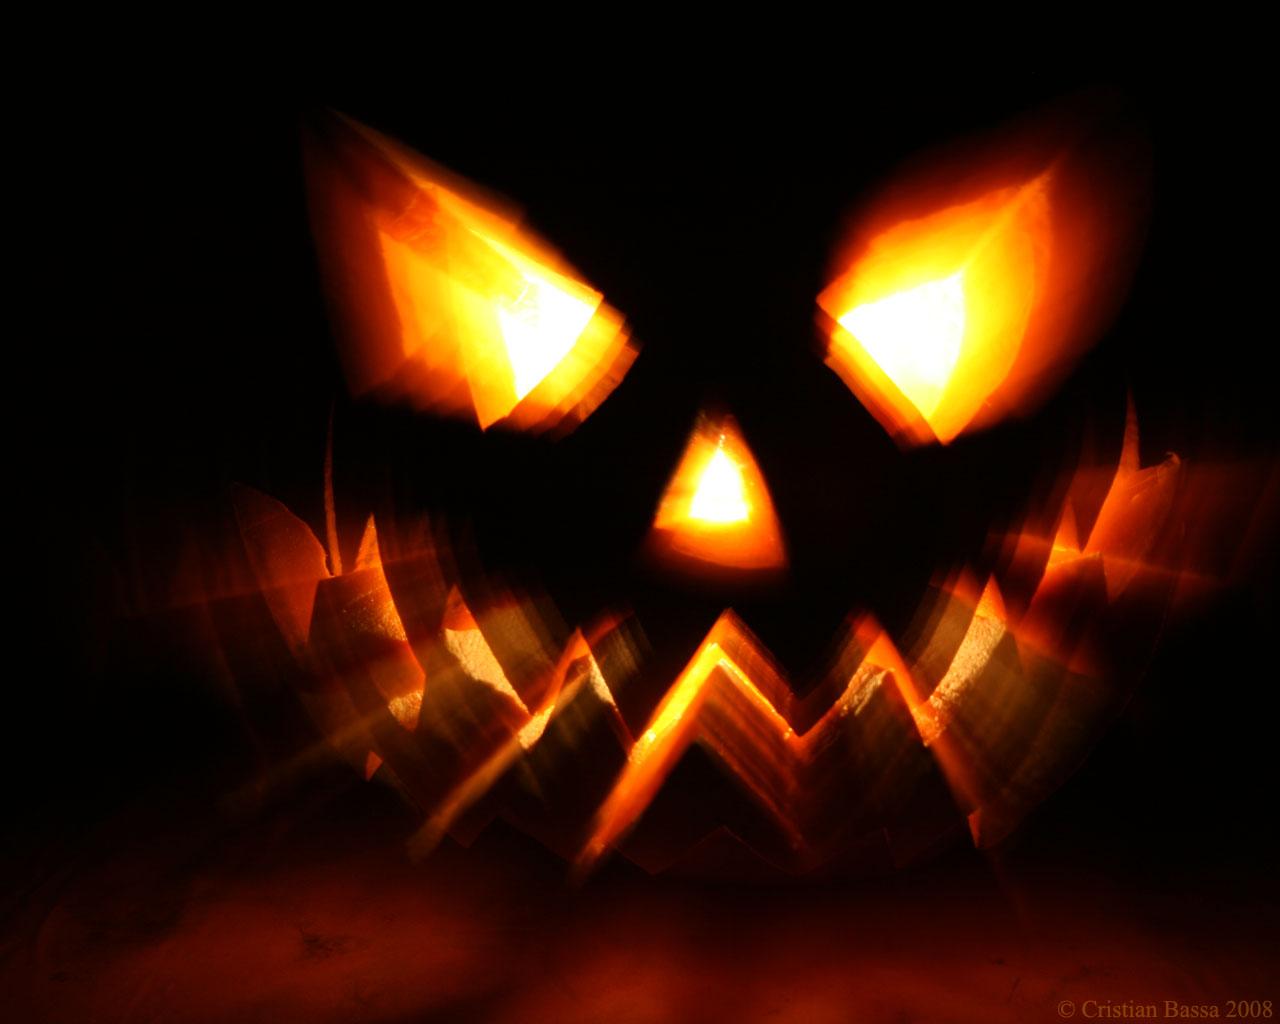 Halloween Wallpaper Screensavers 1280x1024